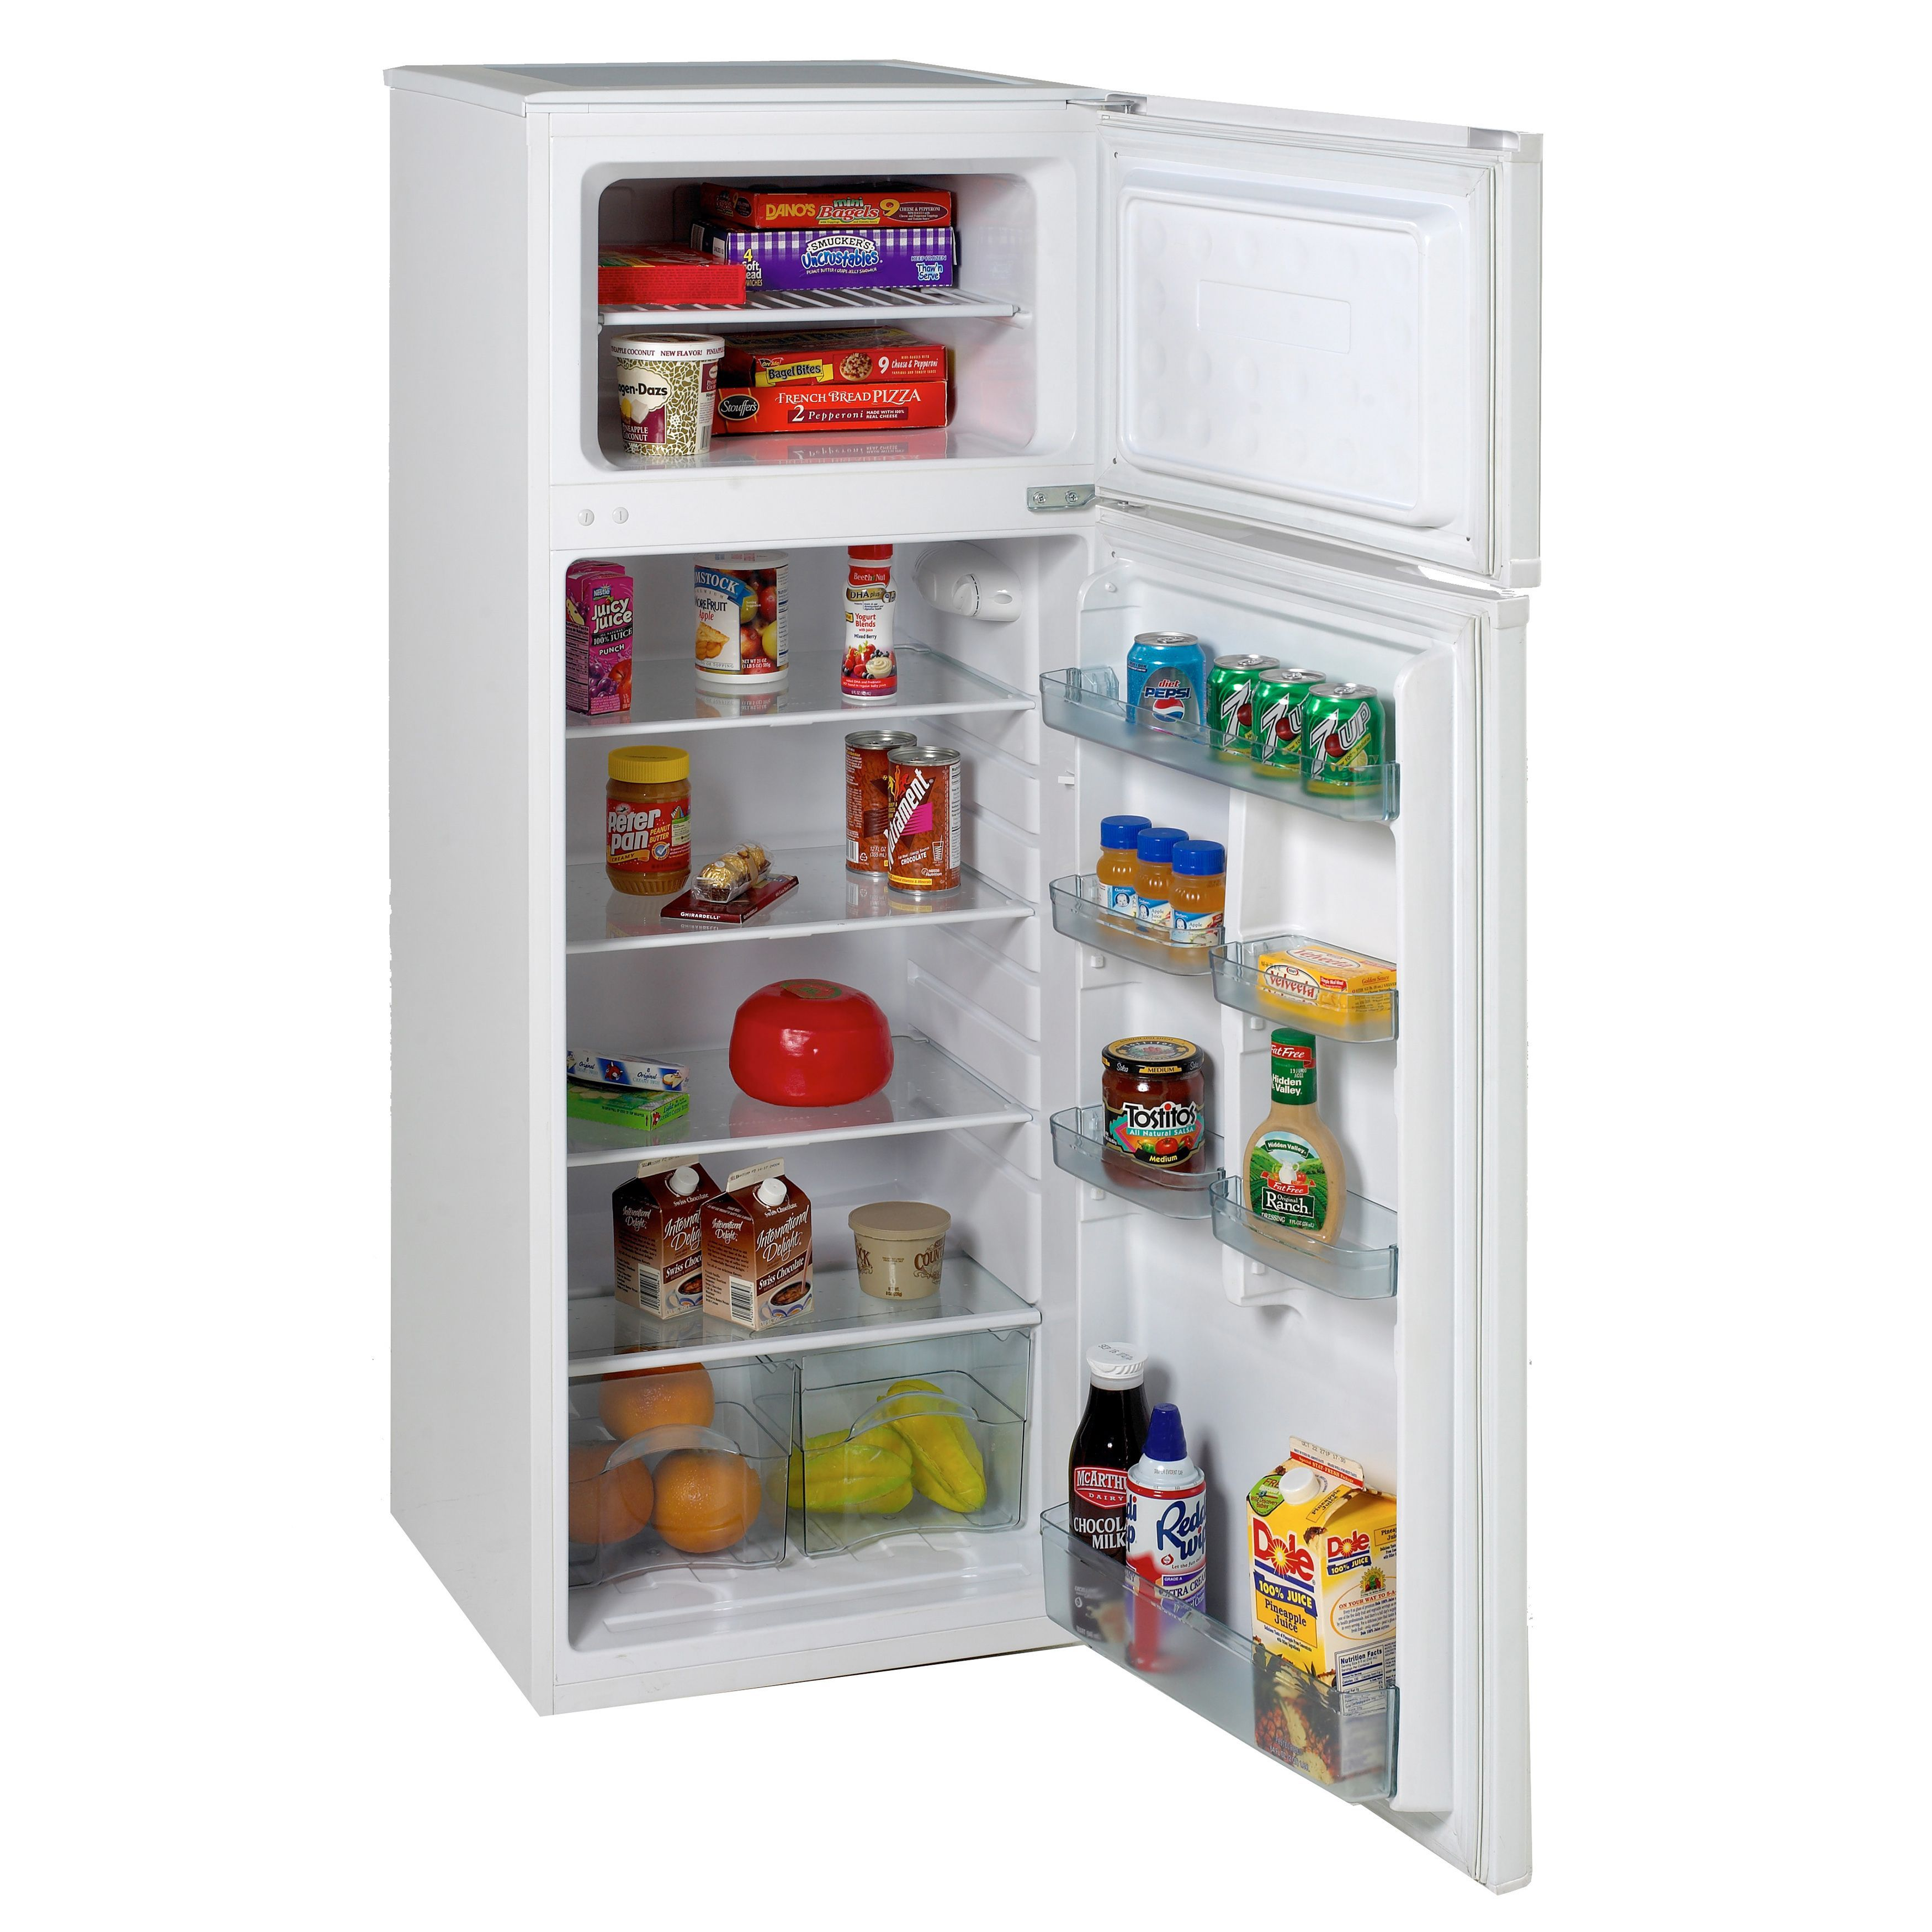 Avanti RA7306WT Apartment size White Refrigerator Freezer